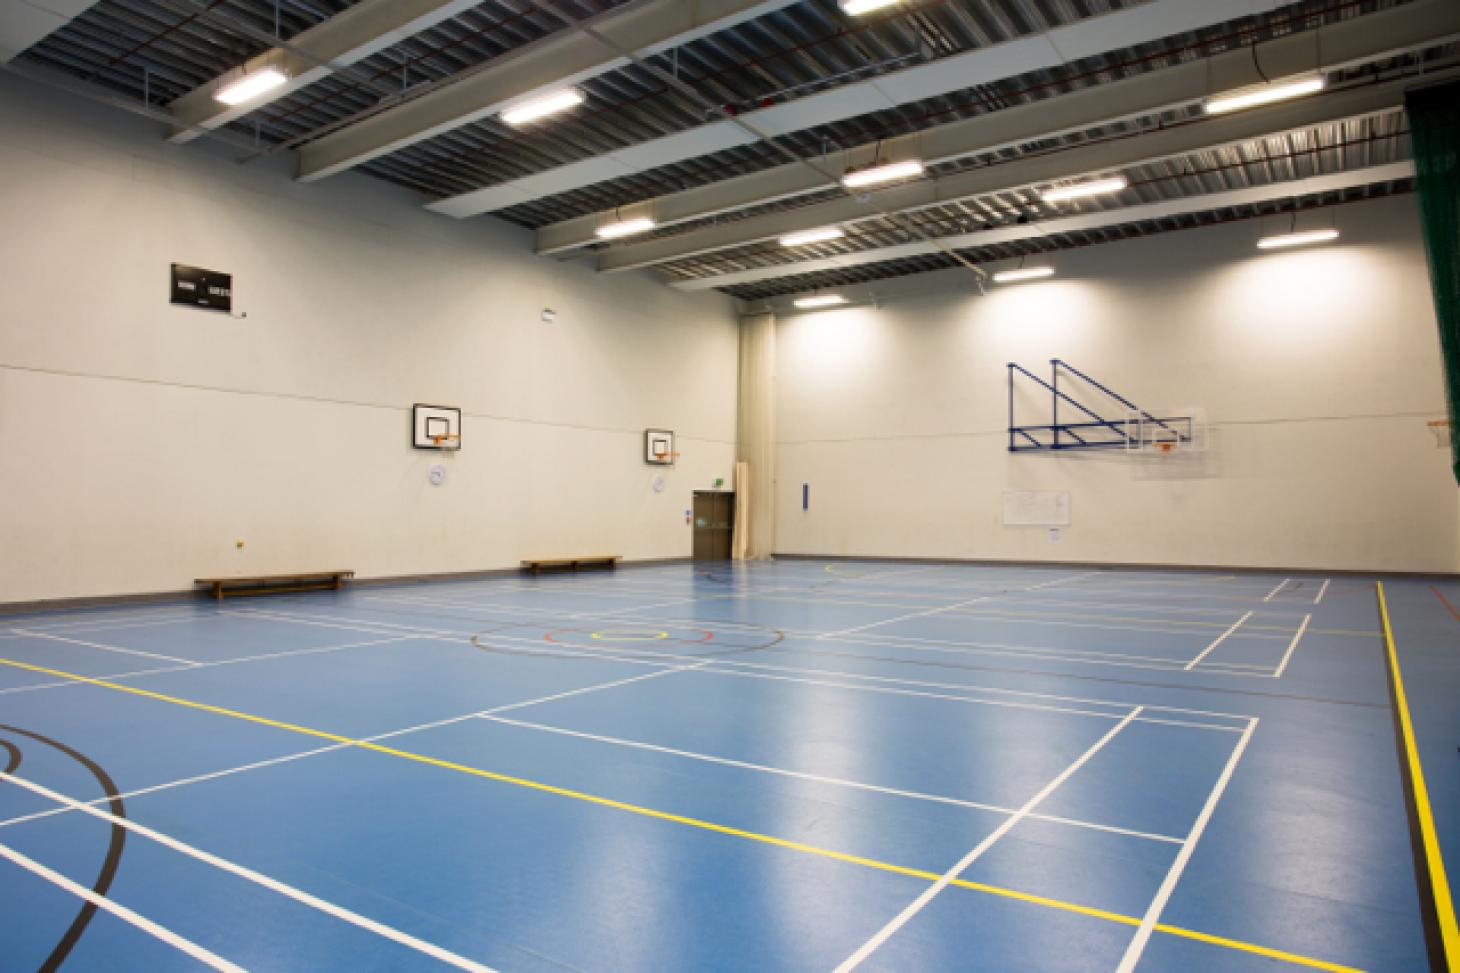 Frederick Bremer School Nets | Artificial cricket facilities